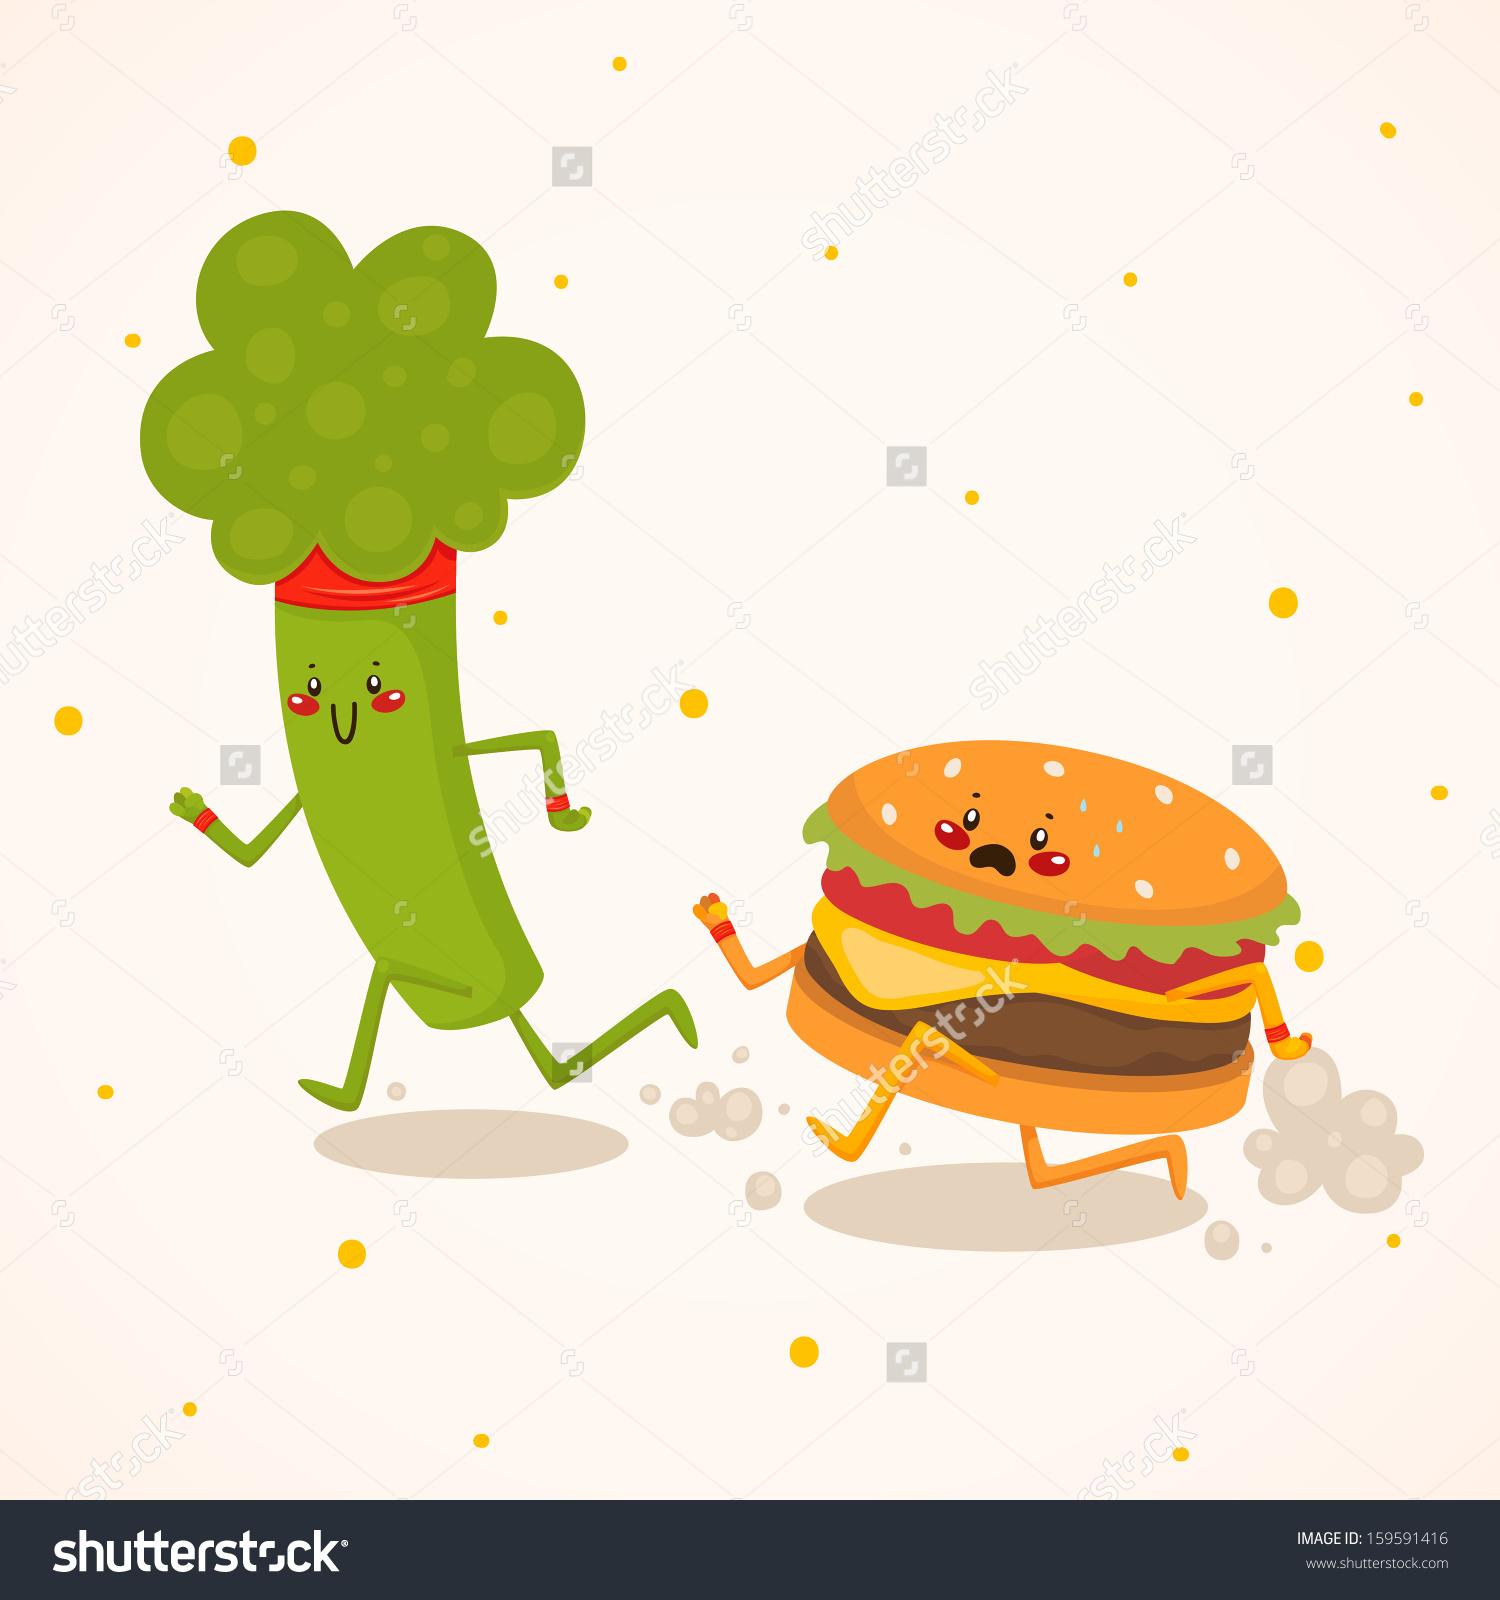 Broccoli Vs Burger Healthy Food Vs Stock Vector 159591416.